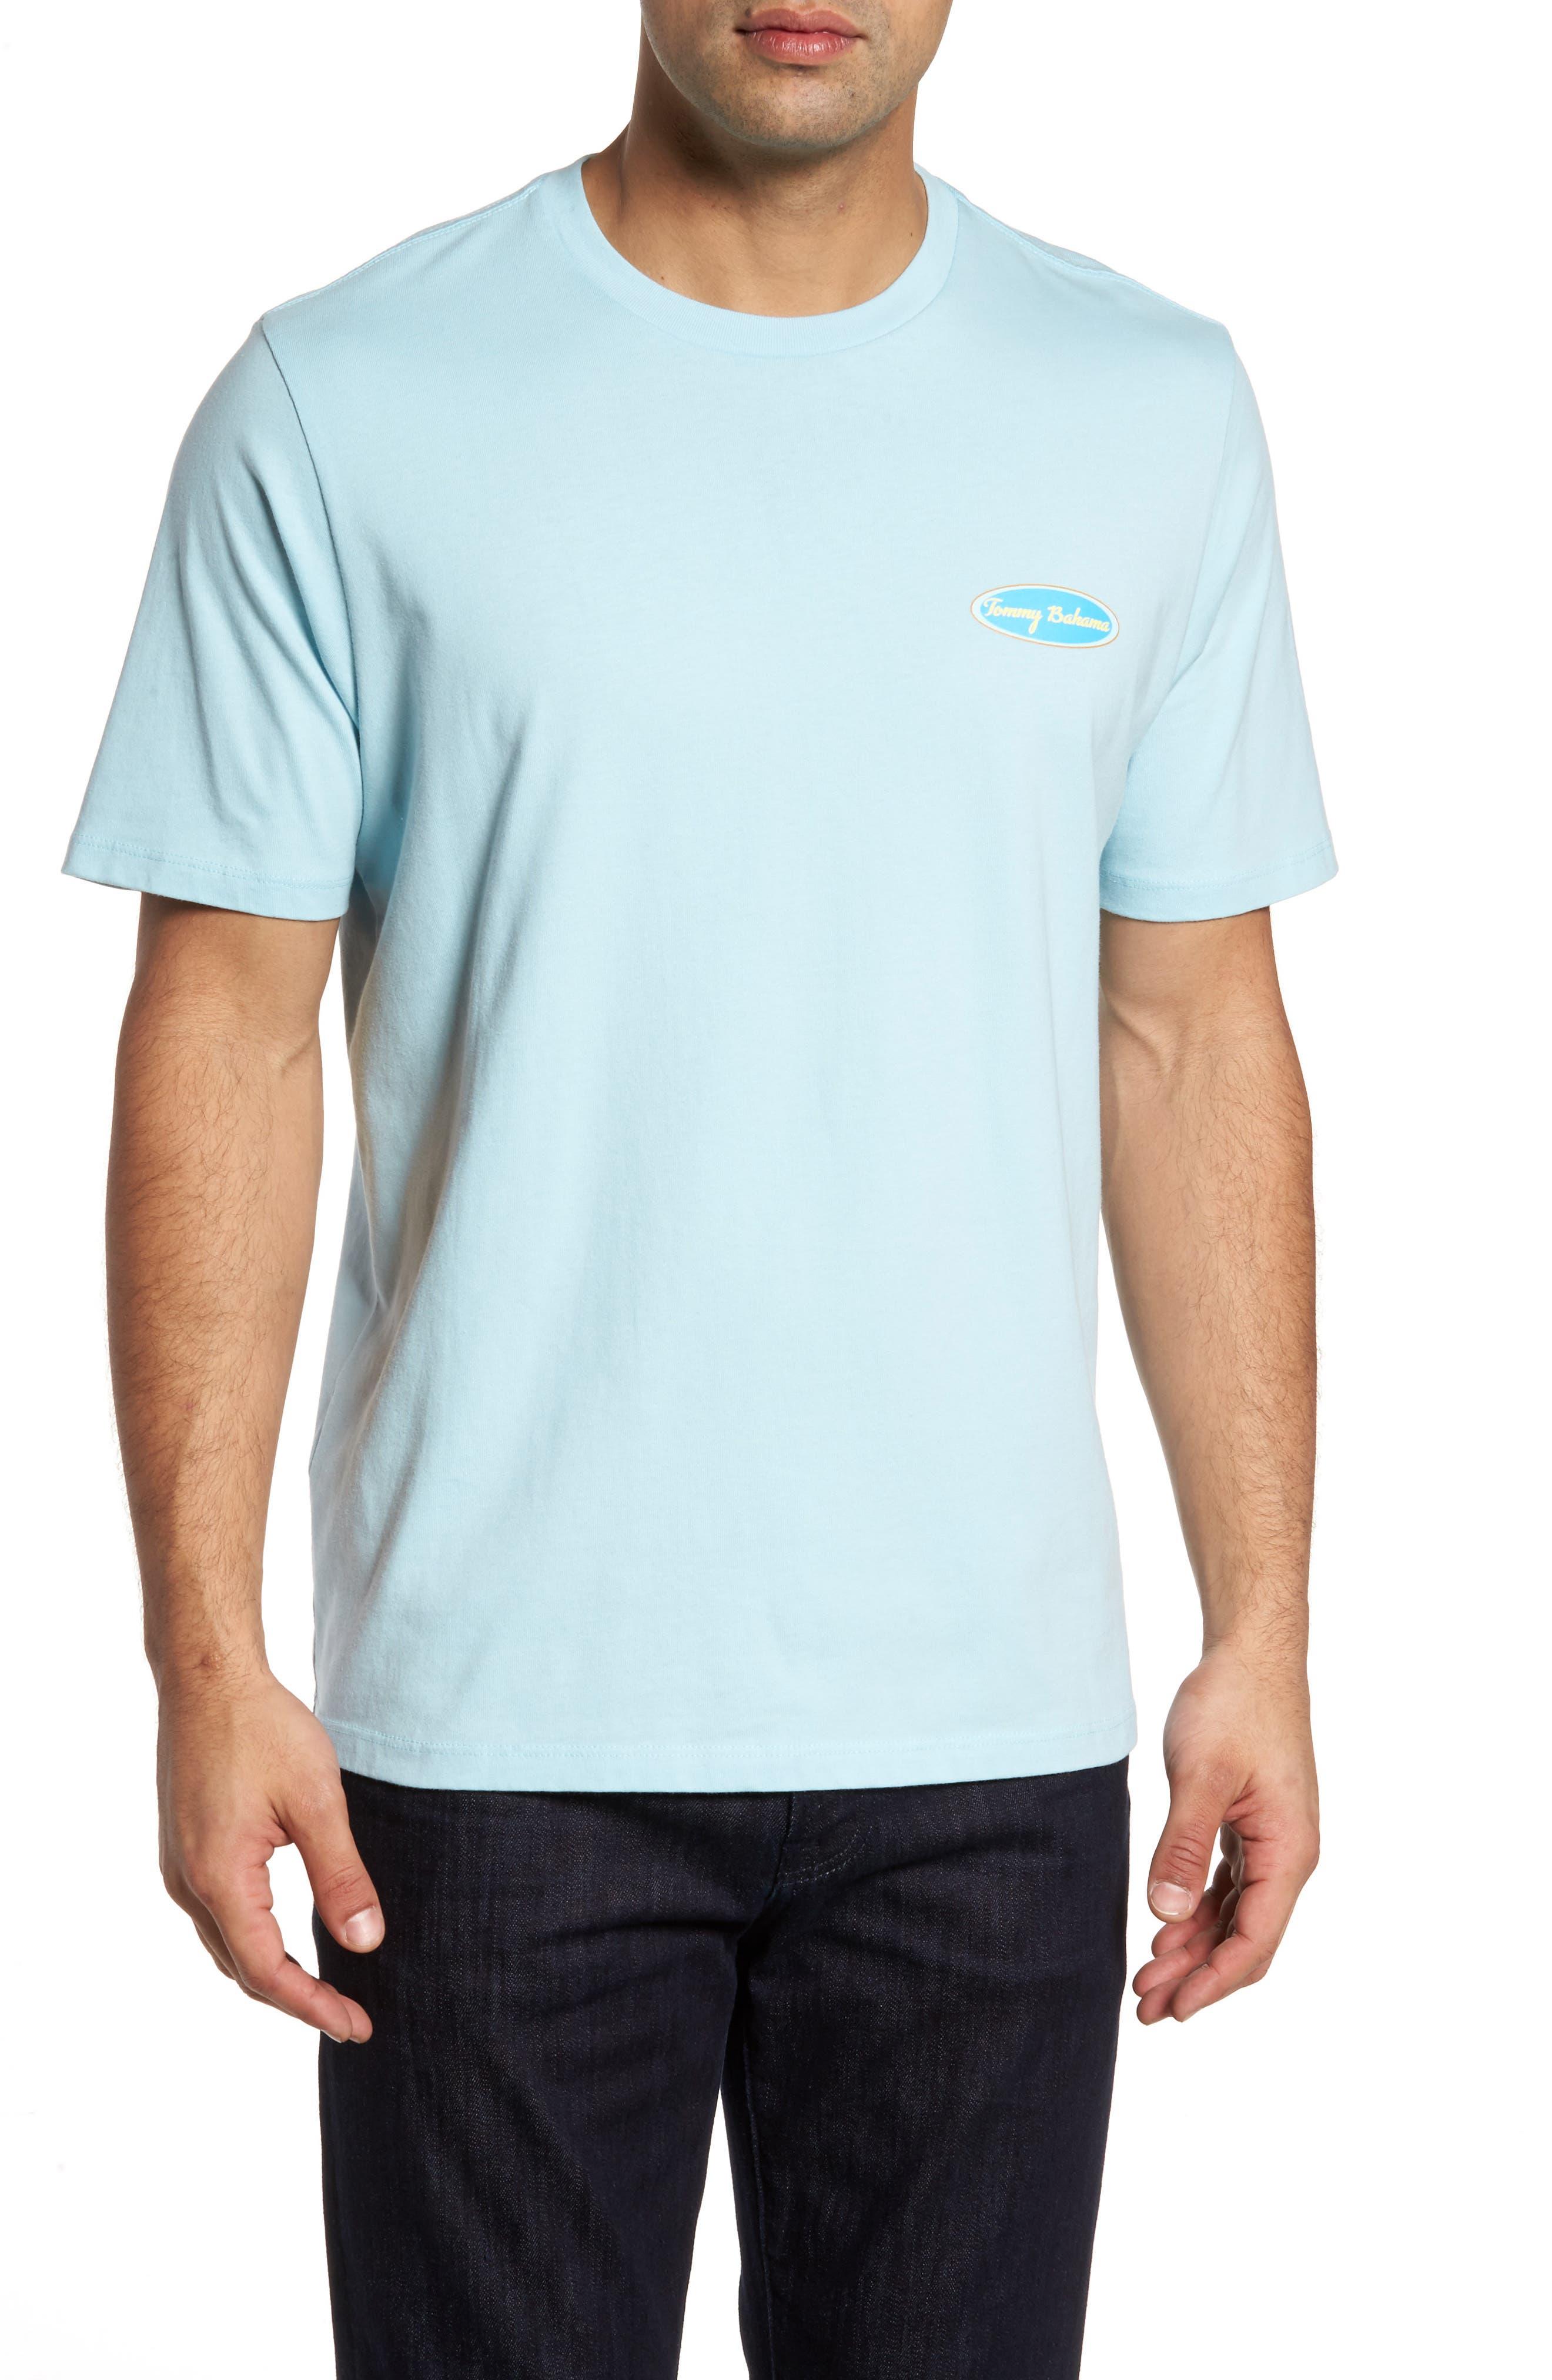 Suns Out T-Shirt,                             Main thumbnail 1, color,                             400